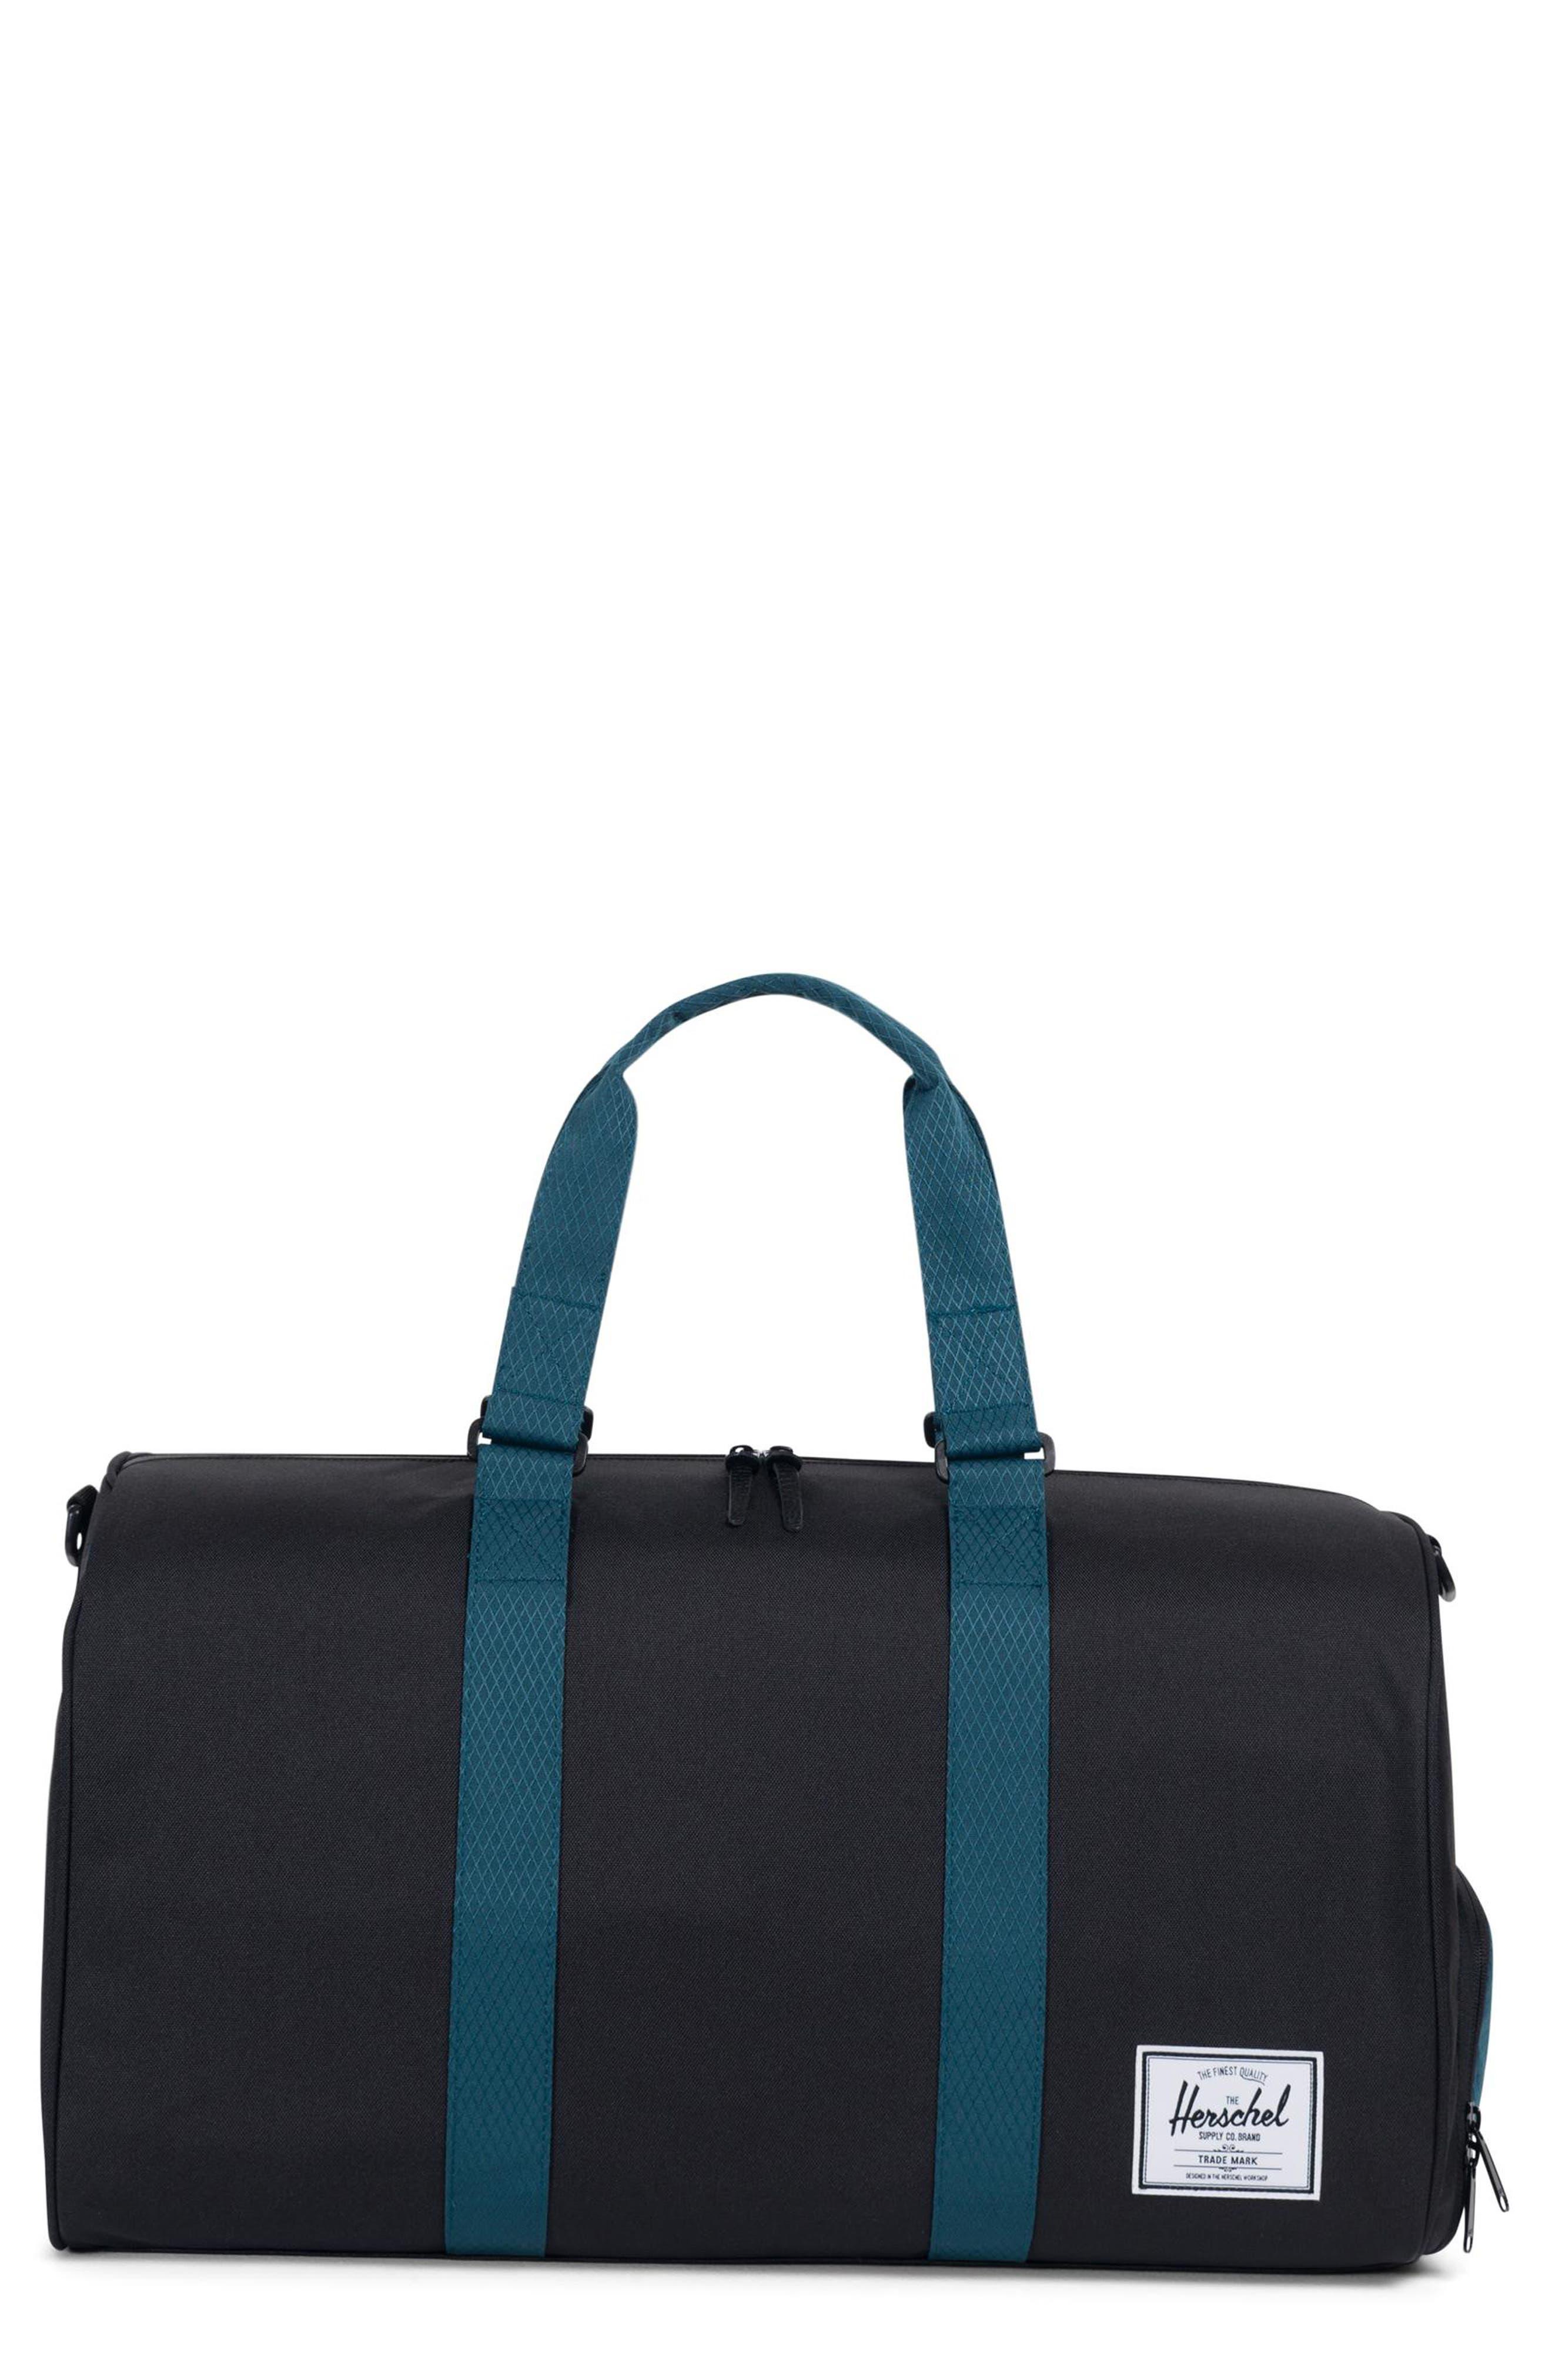 Novel Duffel Bag,                             Main thumbnail 1, color,                             BLACK/ DEEP TEAL